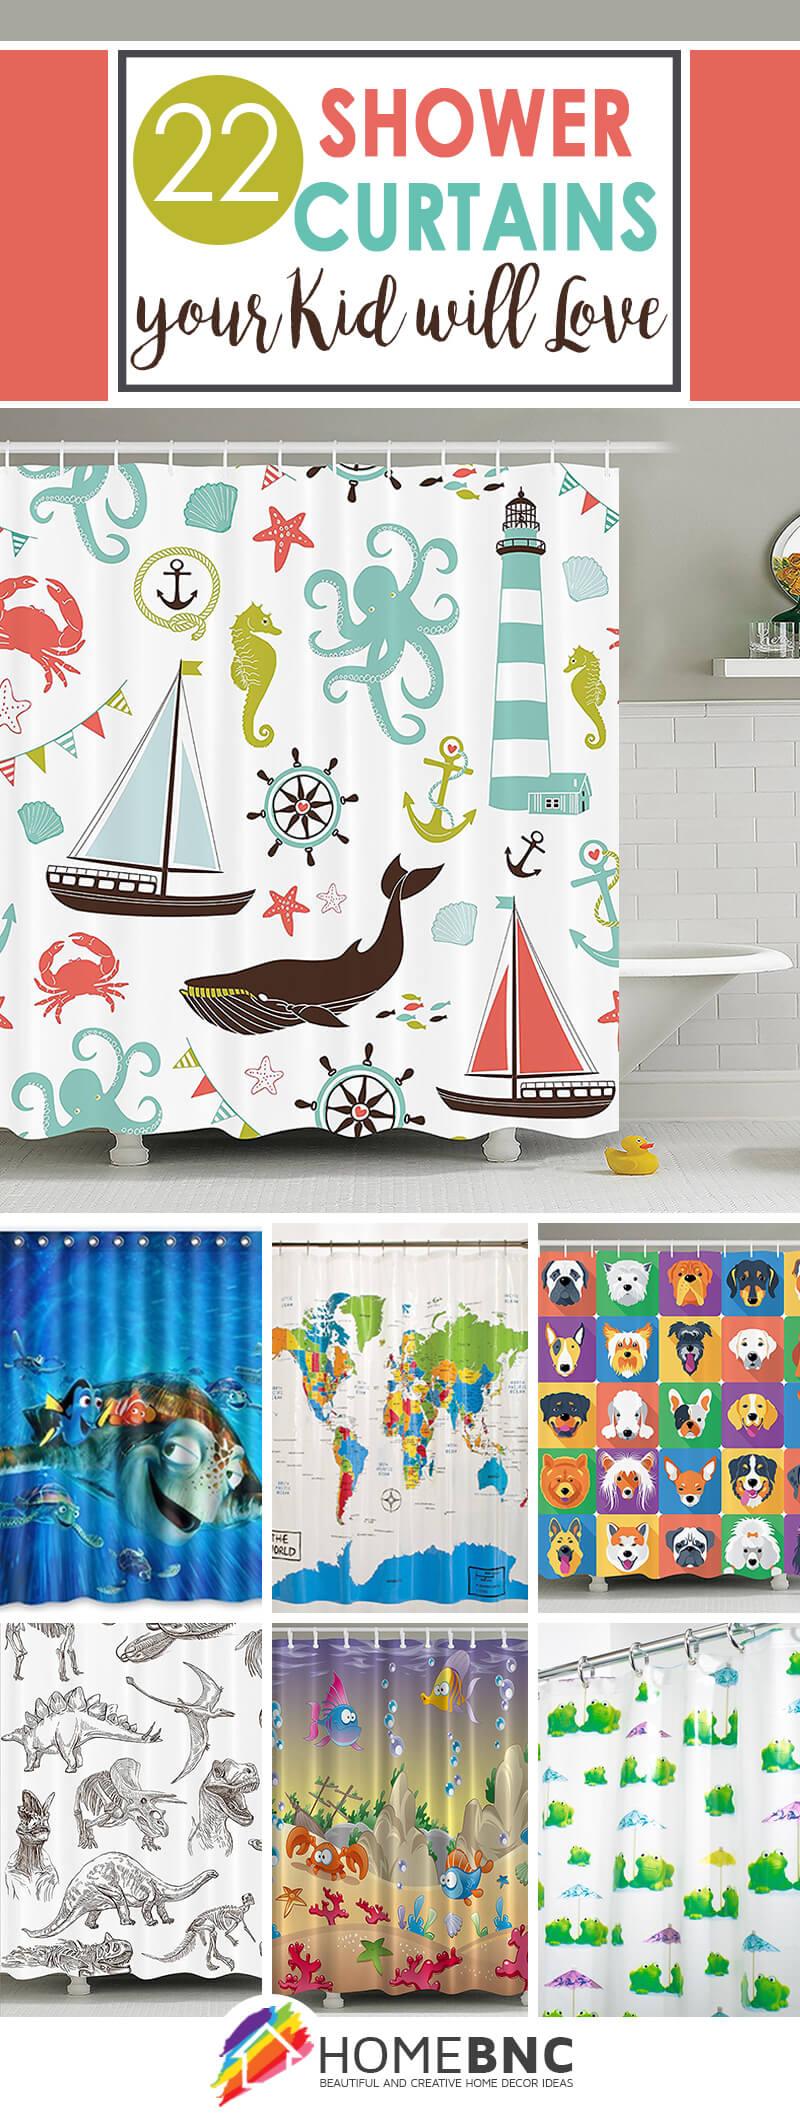 Kidu0027s Shower Curtain Ideas